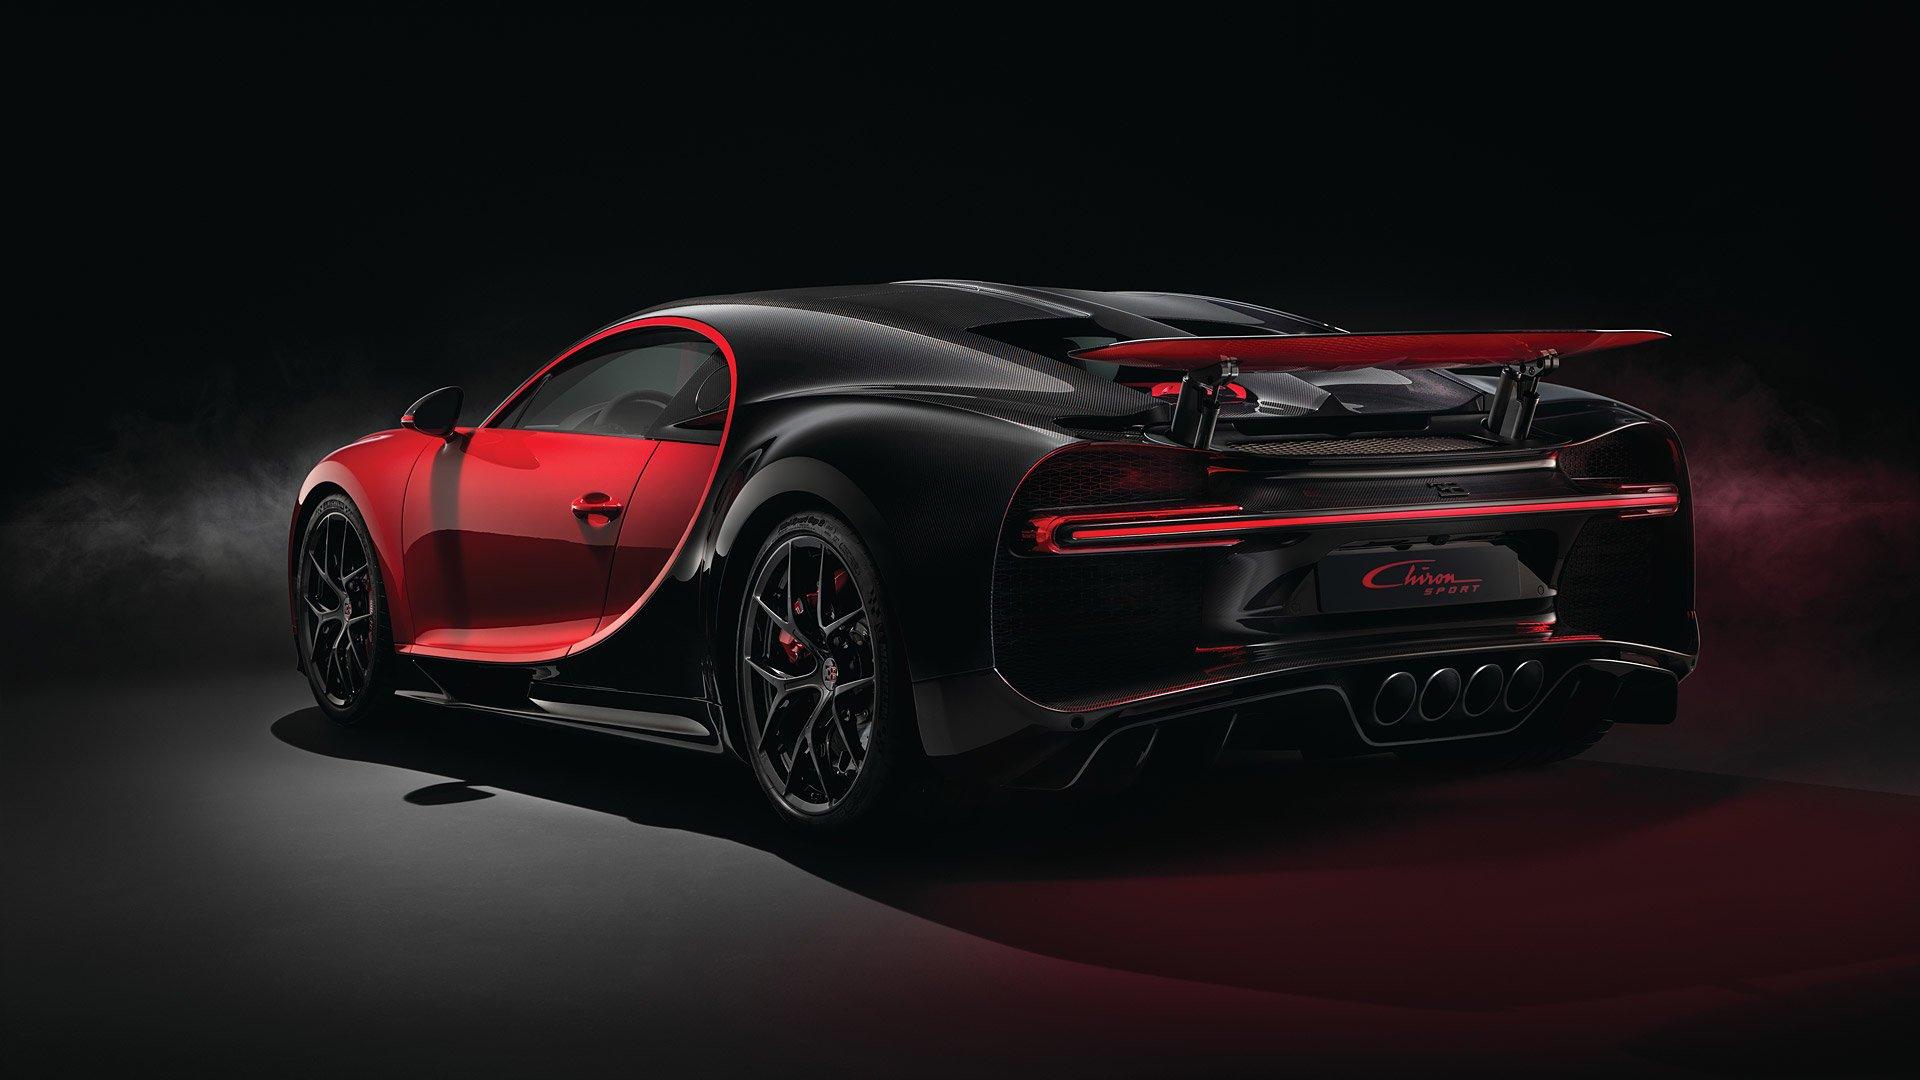 Vehicles - Bugatti Chiron  Bugatti Chiron Sport Sport Car Hypercar Red Car Car Wallpaper